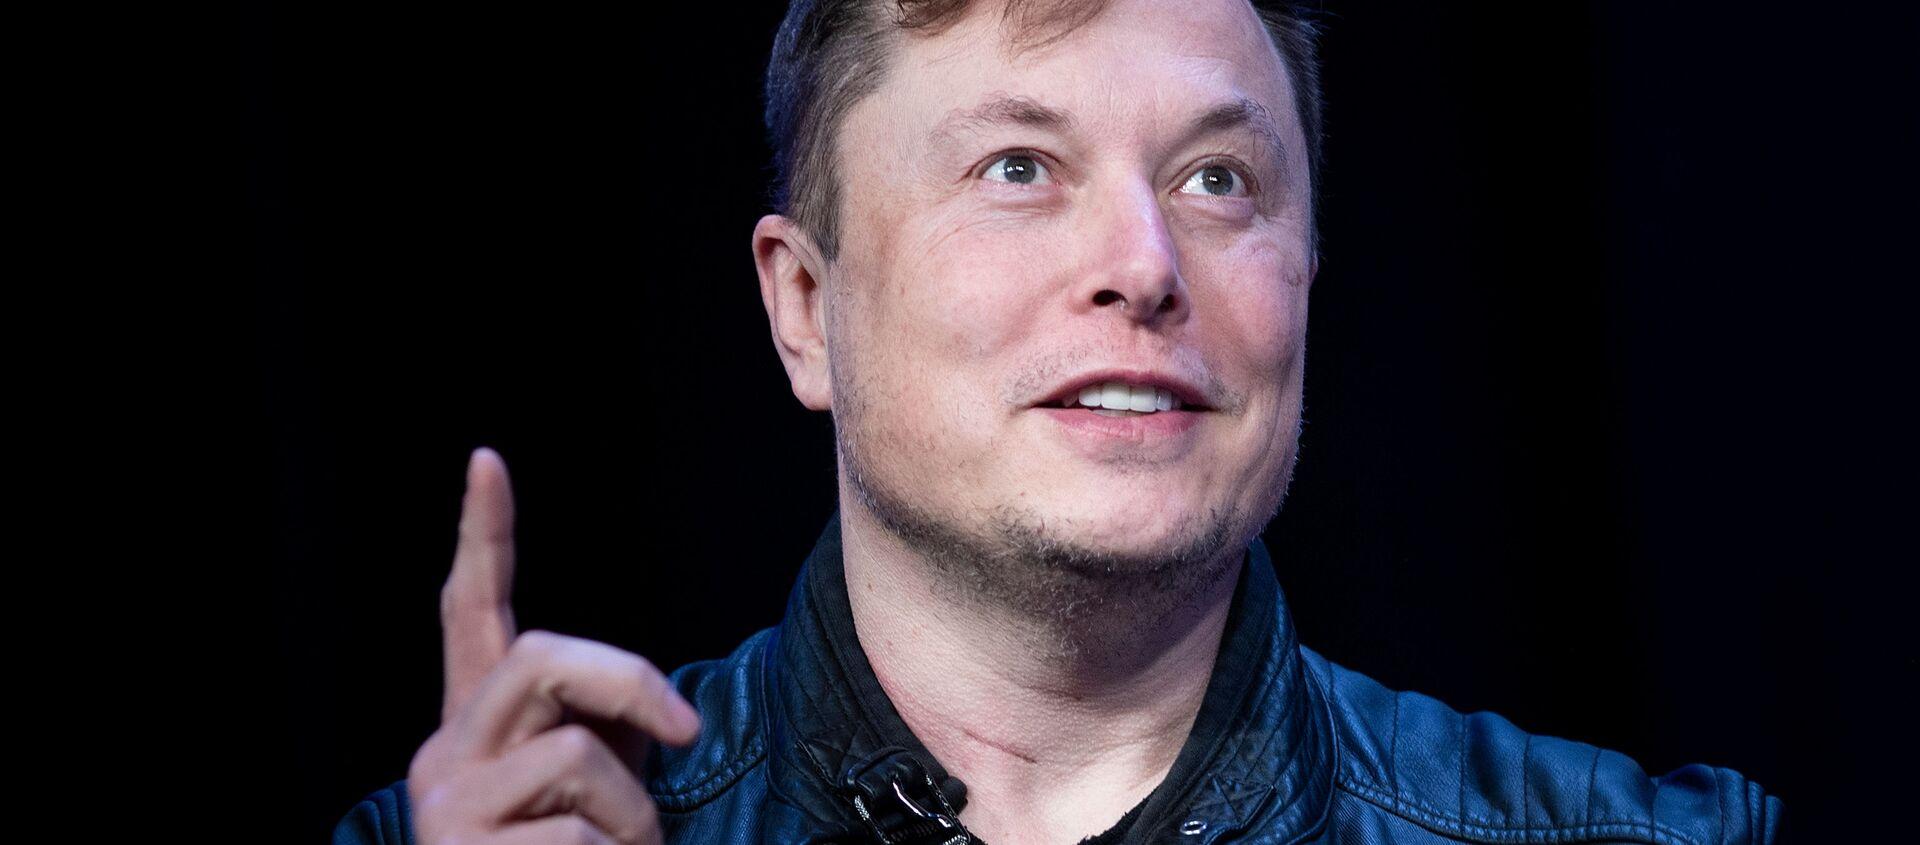 Гендиректор SpaceX Илон Маск - Sputnik Беларусь, 1920, 13.02.2021